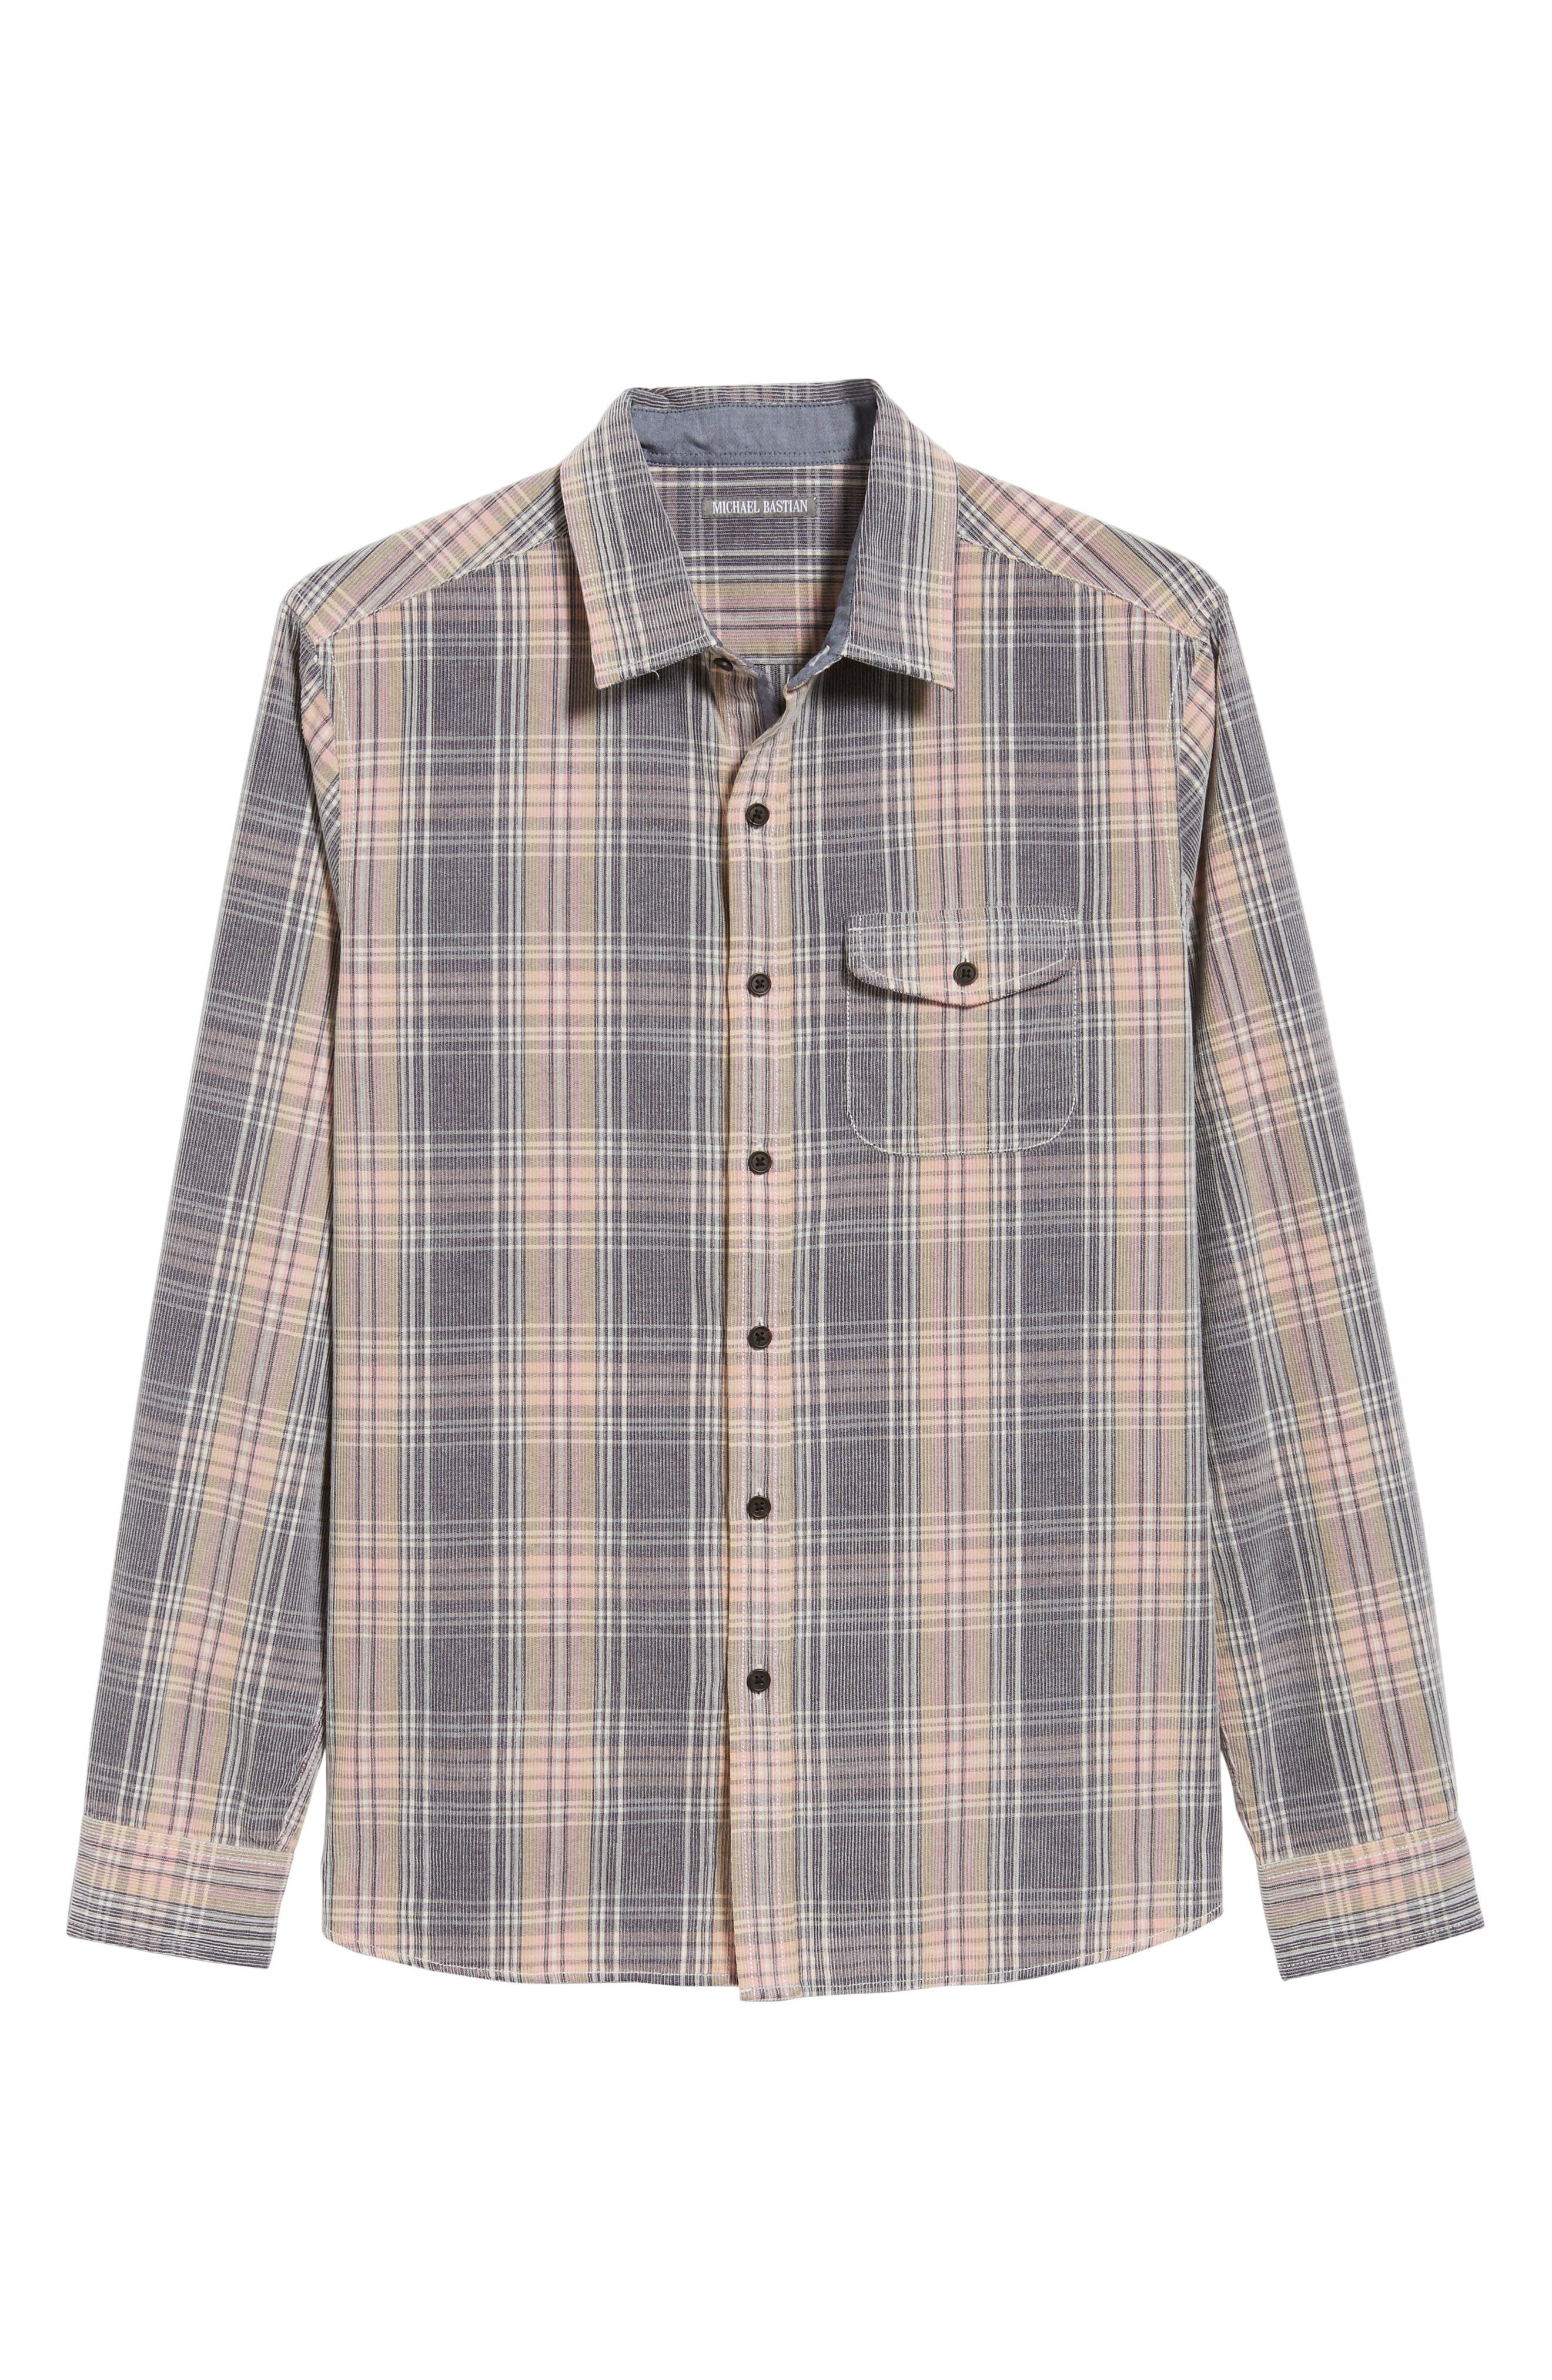 Regular Fit Plaid Corduroy Shirt,                             Alternate thumbnail 5, color,                             602